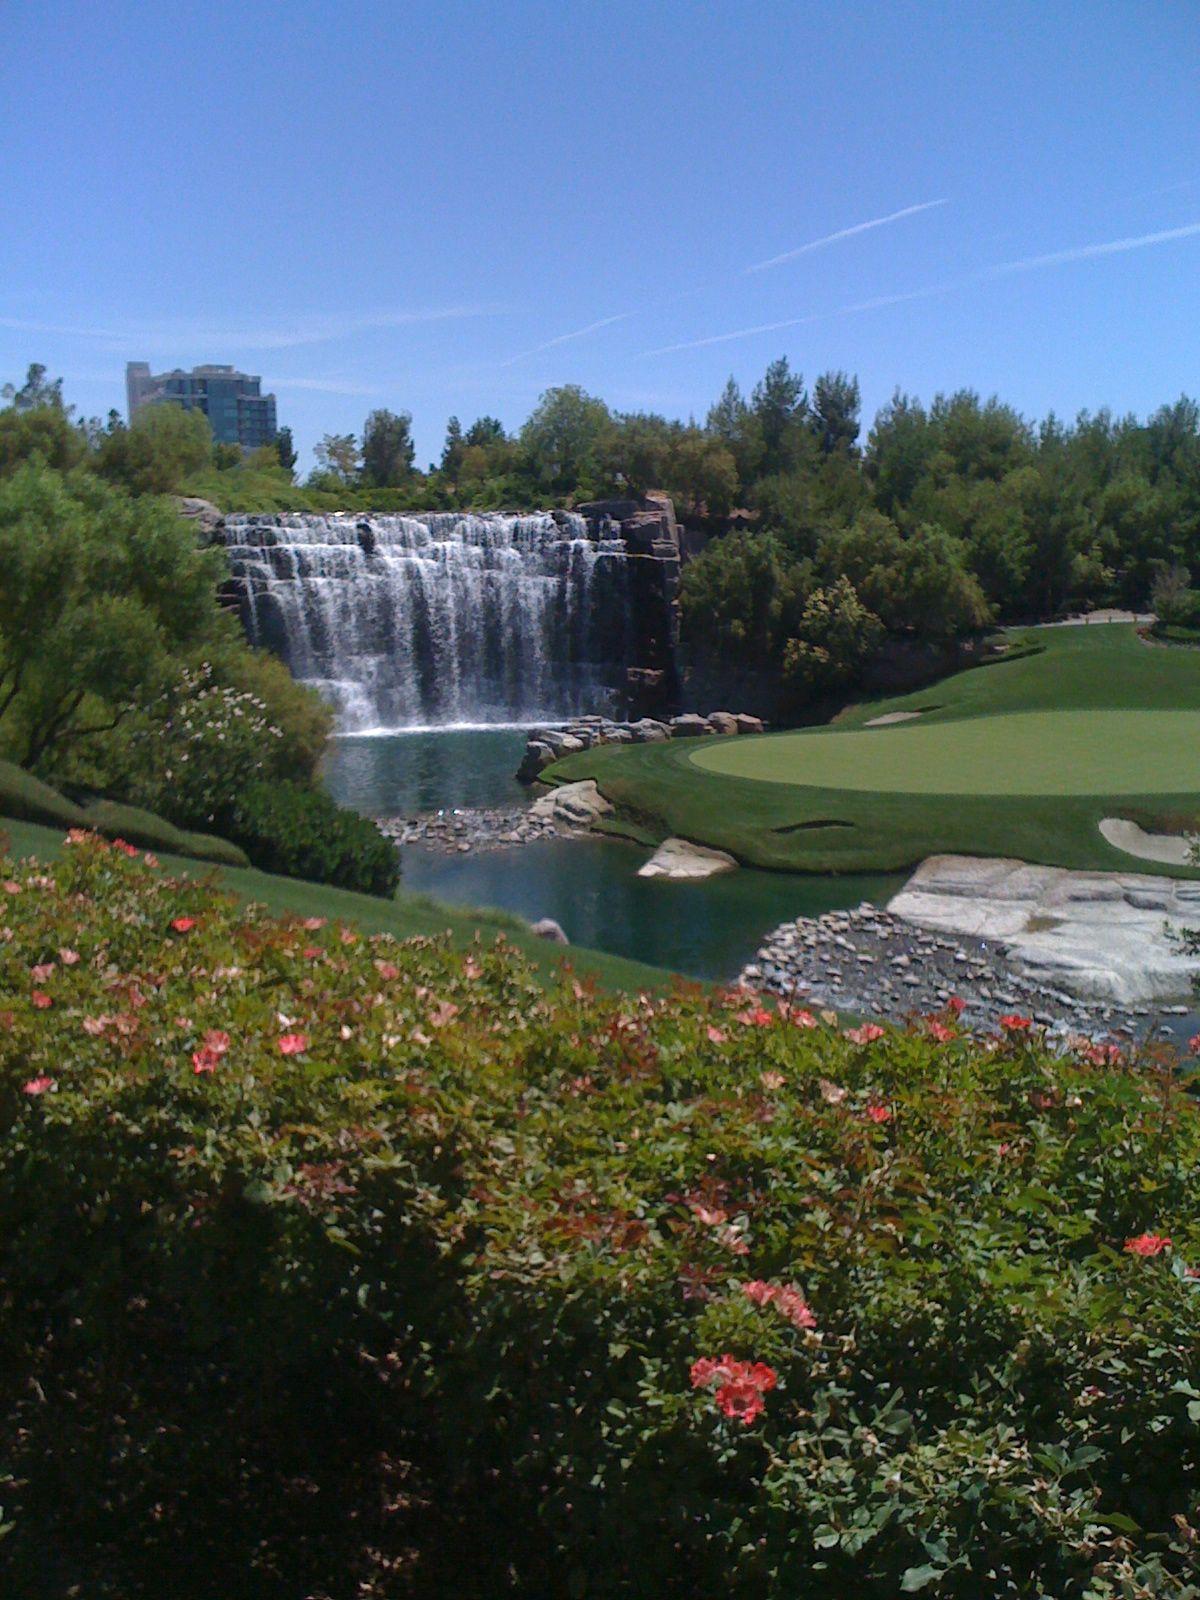 wynn las vegas golf course | Golf courses, Las vegas golf ...